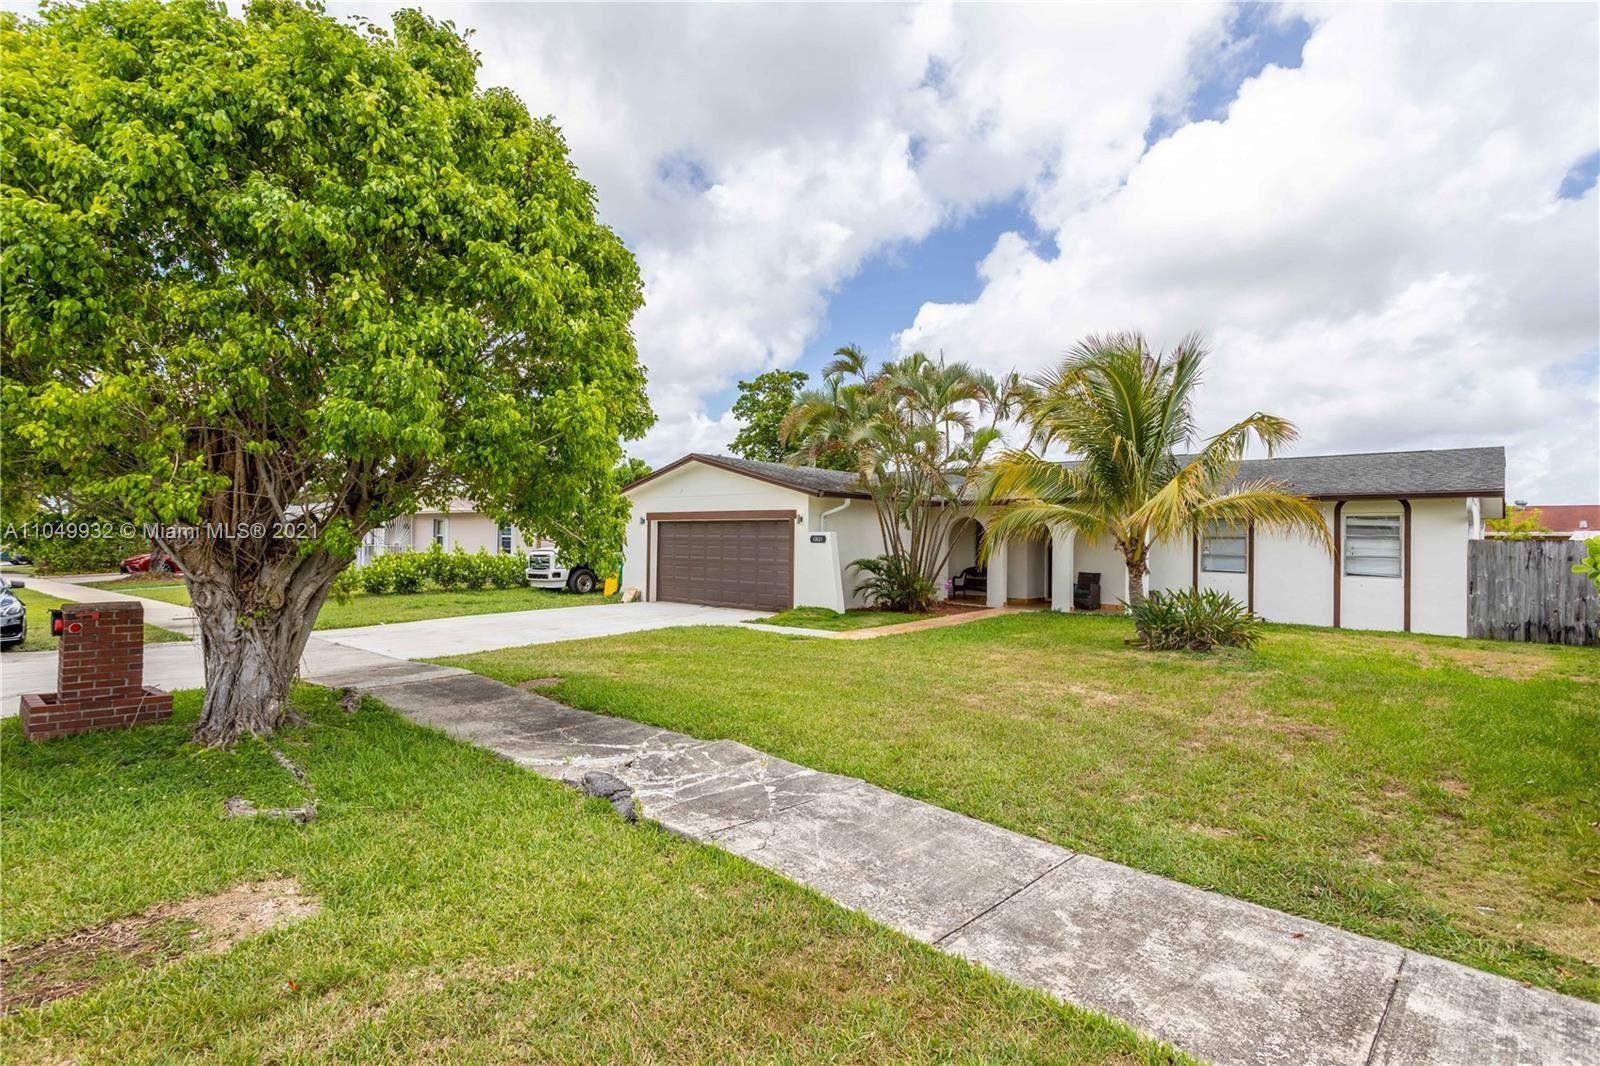 13021 SW 82nd Ter, Miami, FL 33183 - #: A11049932